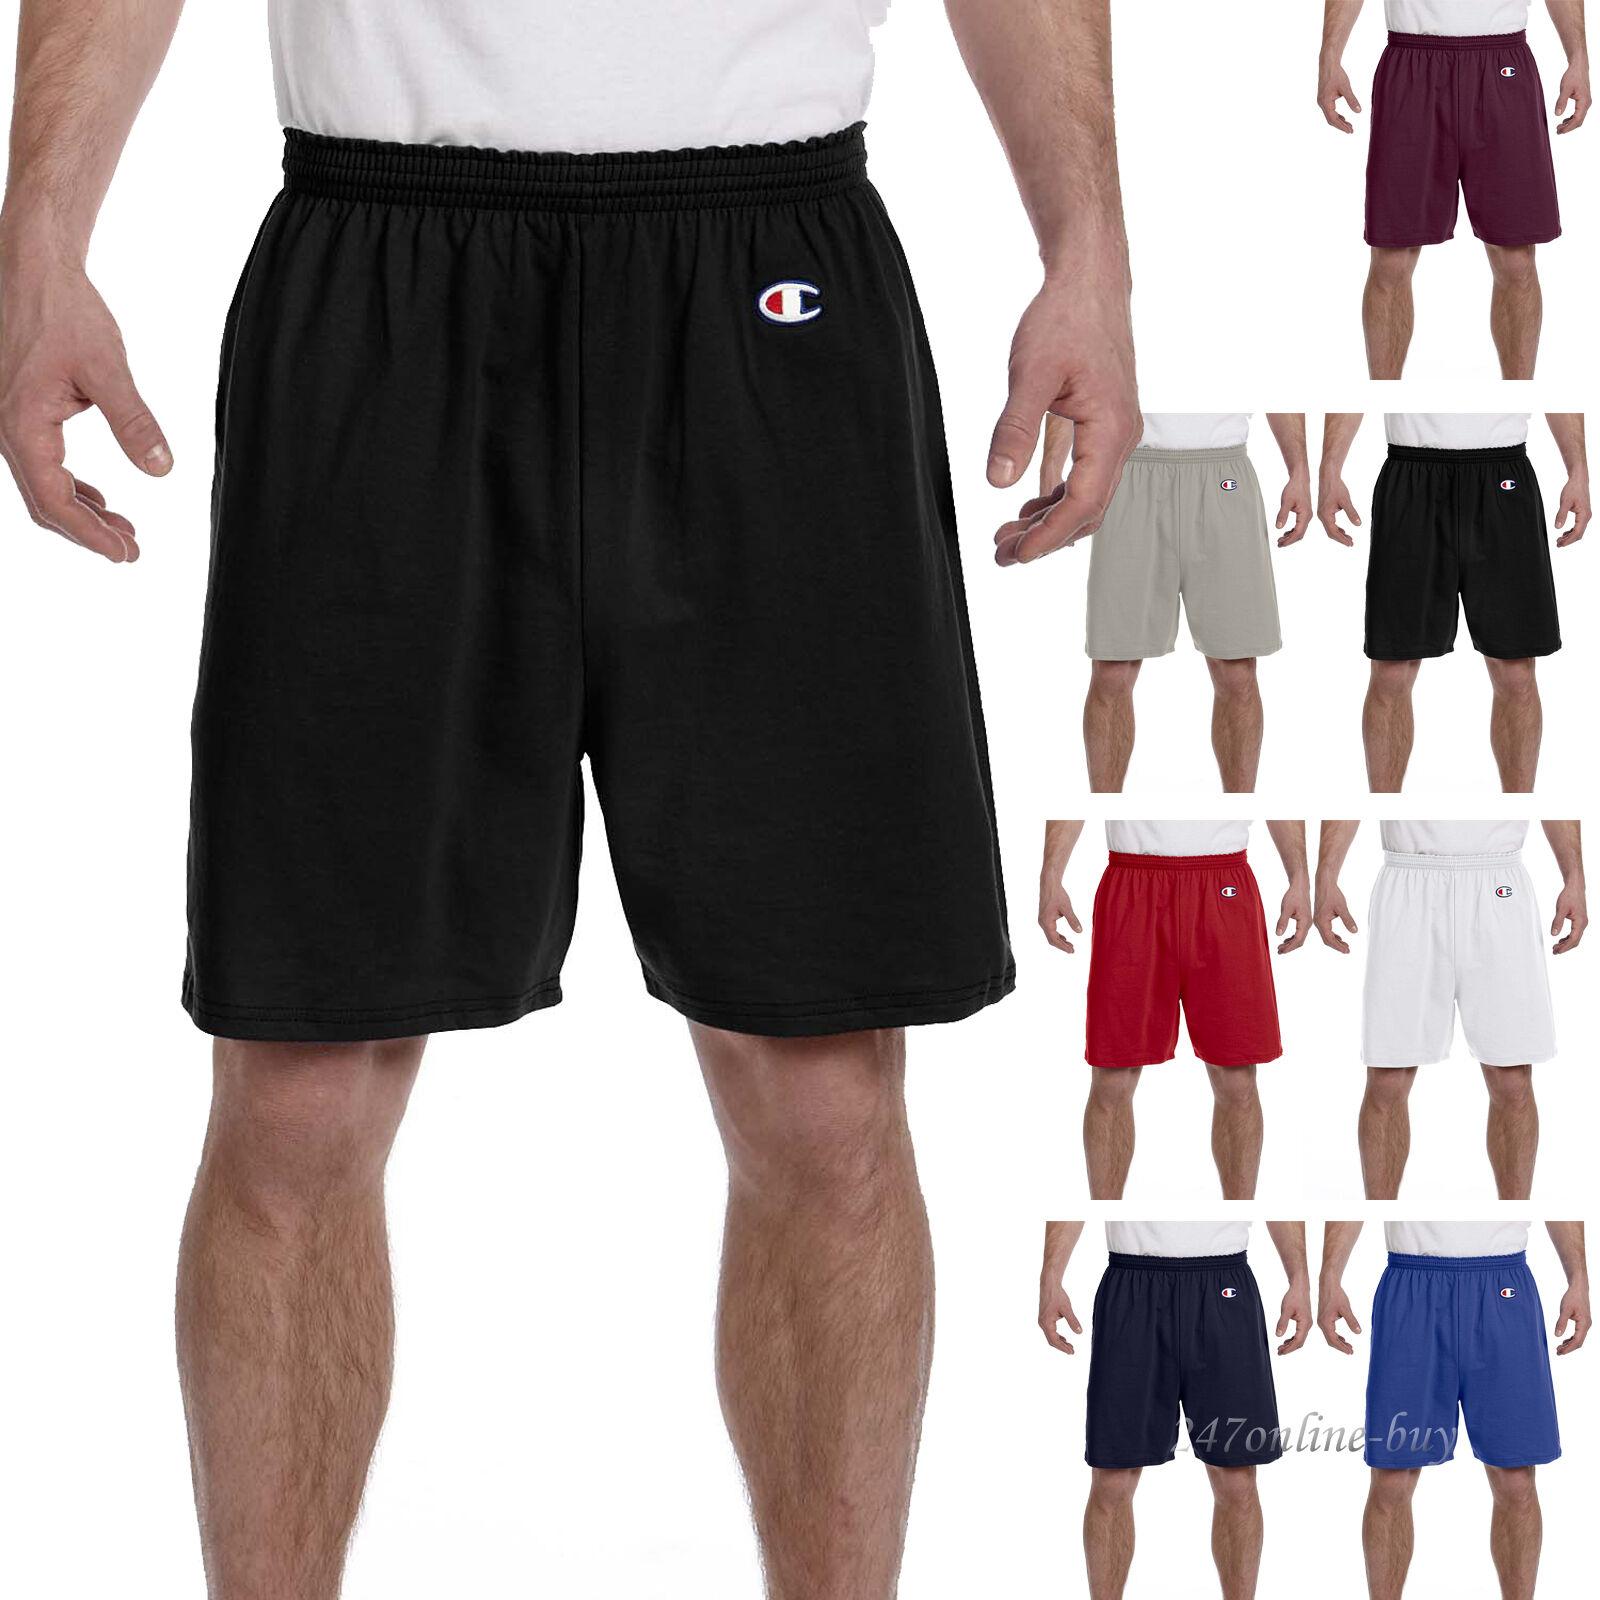 "Champion Mens Cotton Shorts 6"" Inseam Gym Athletic Basketbal"